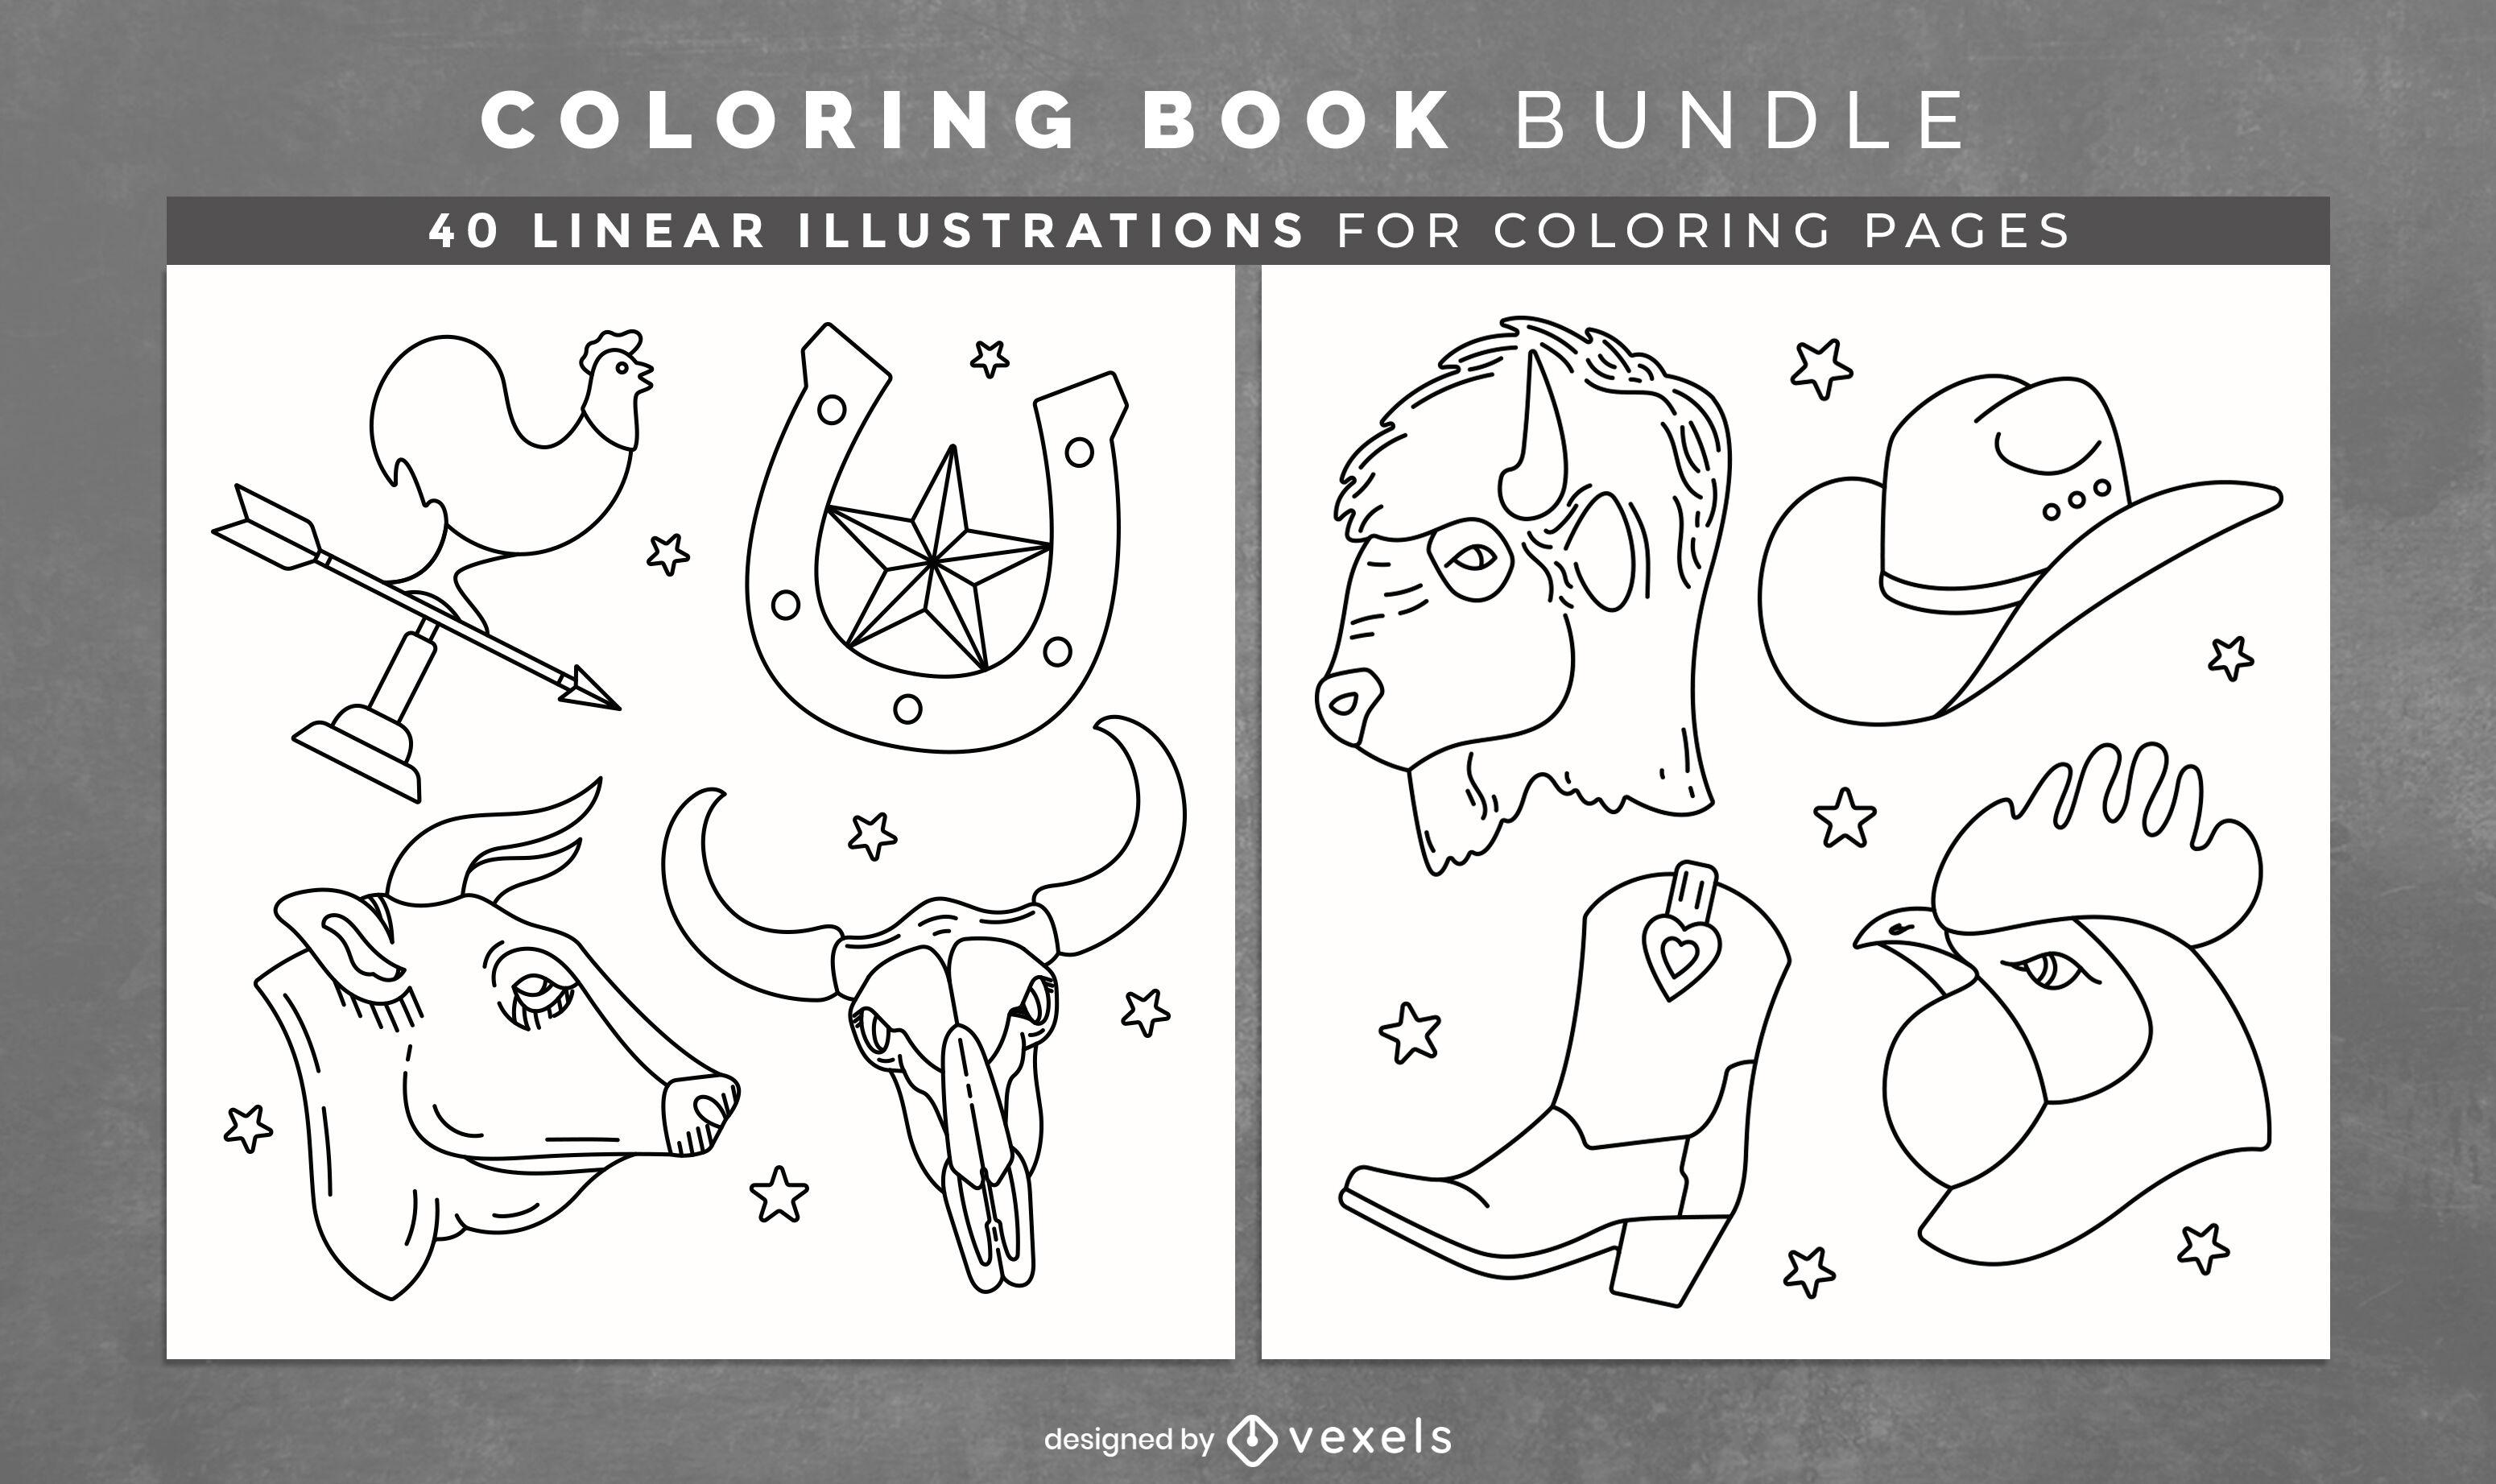 Cowboy ranch coloring book design pages